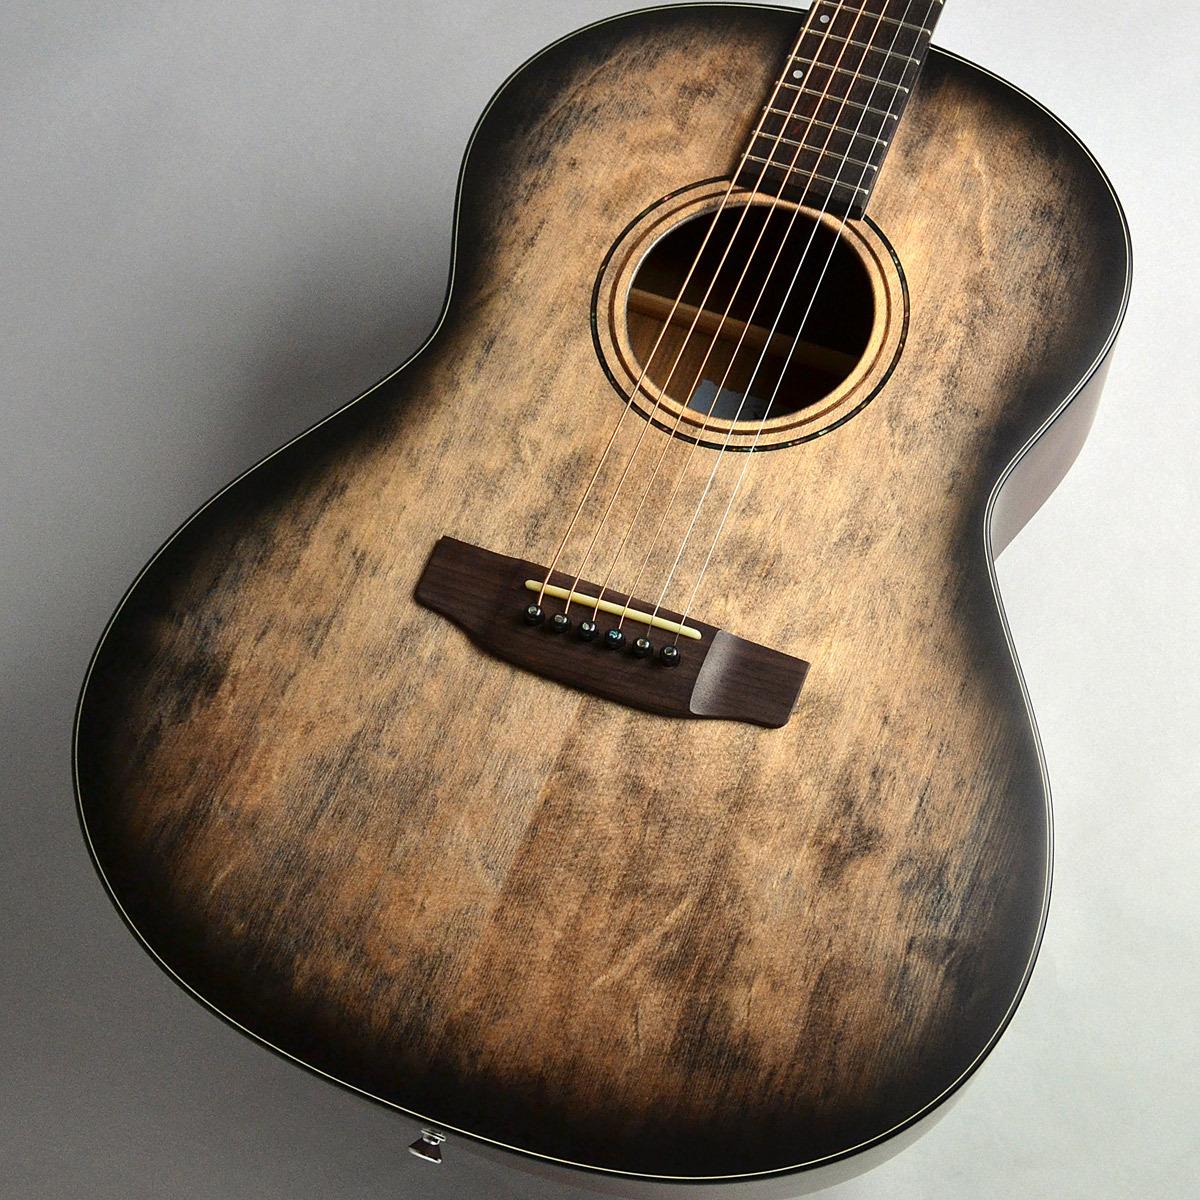 K.Yairi SRF-OV2/VBB アコースティックギター 【Kヤイリ 島村楽器限定販売モデル】【新宿PePe店】